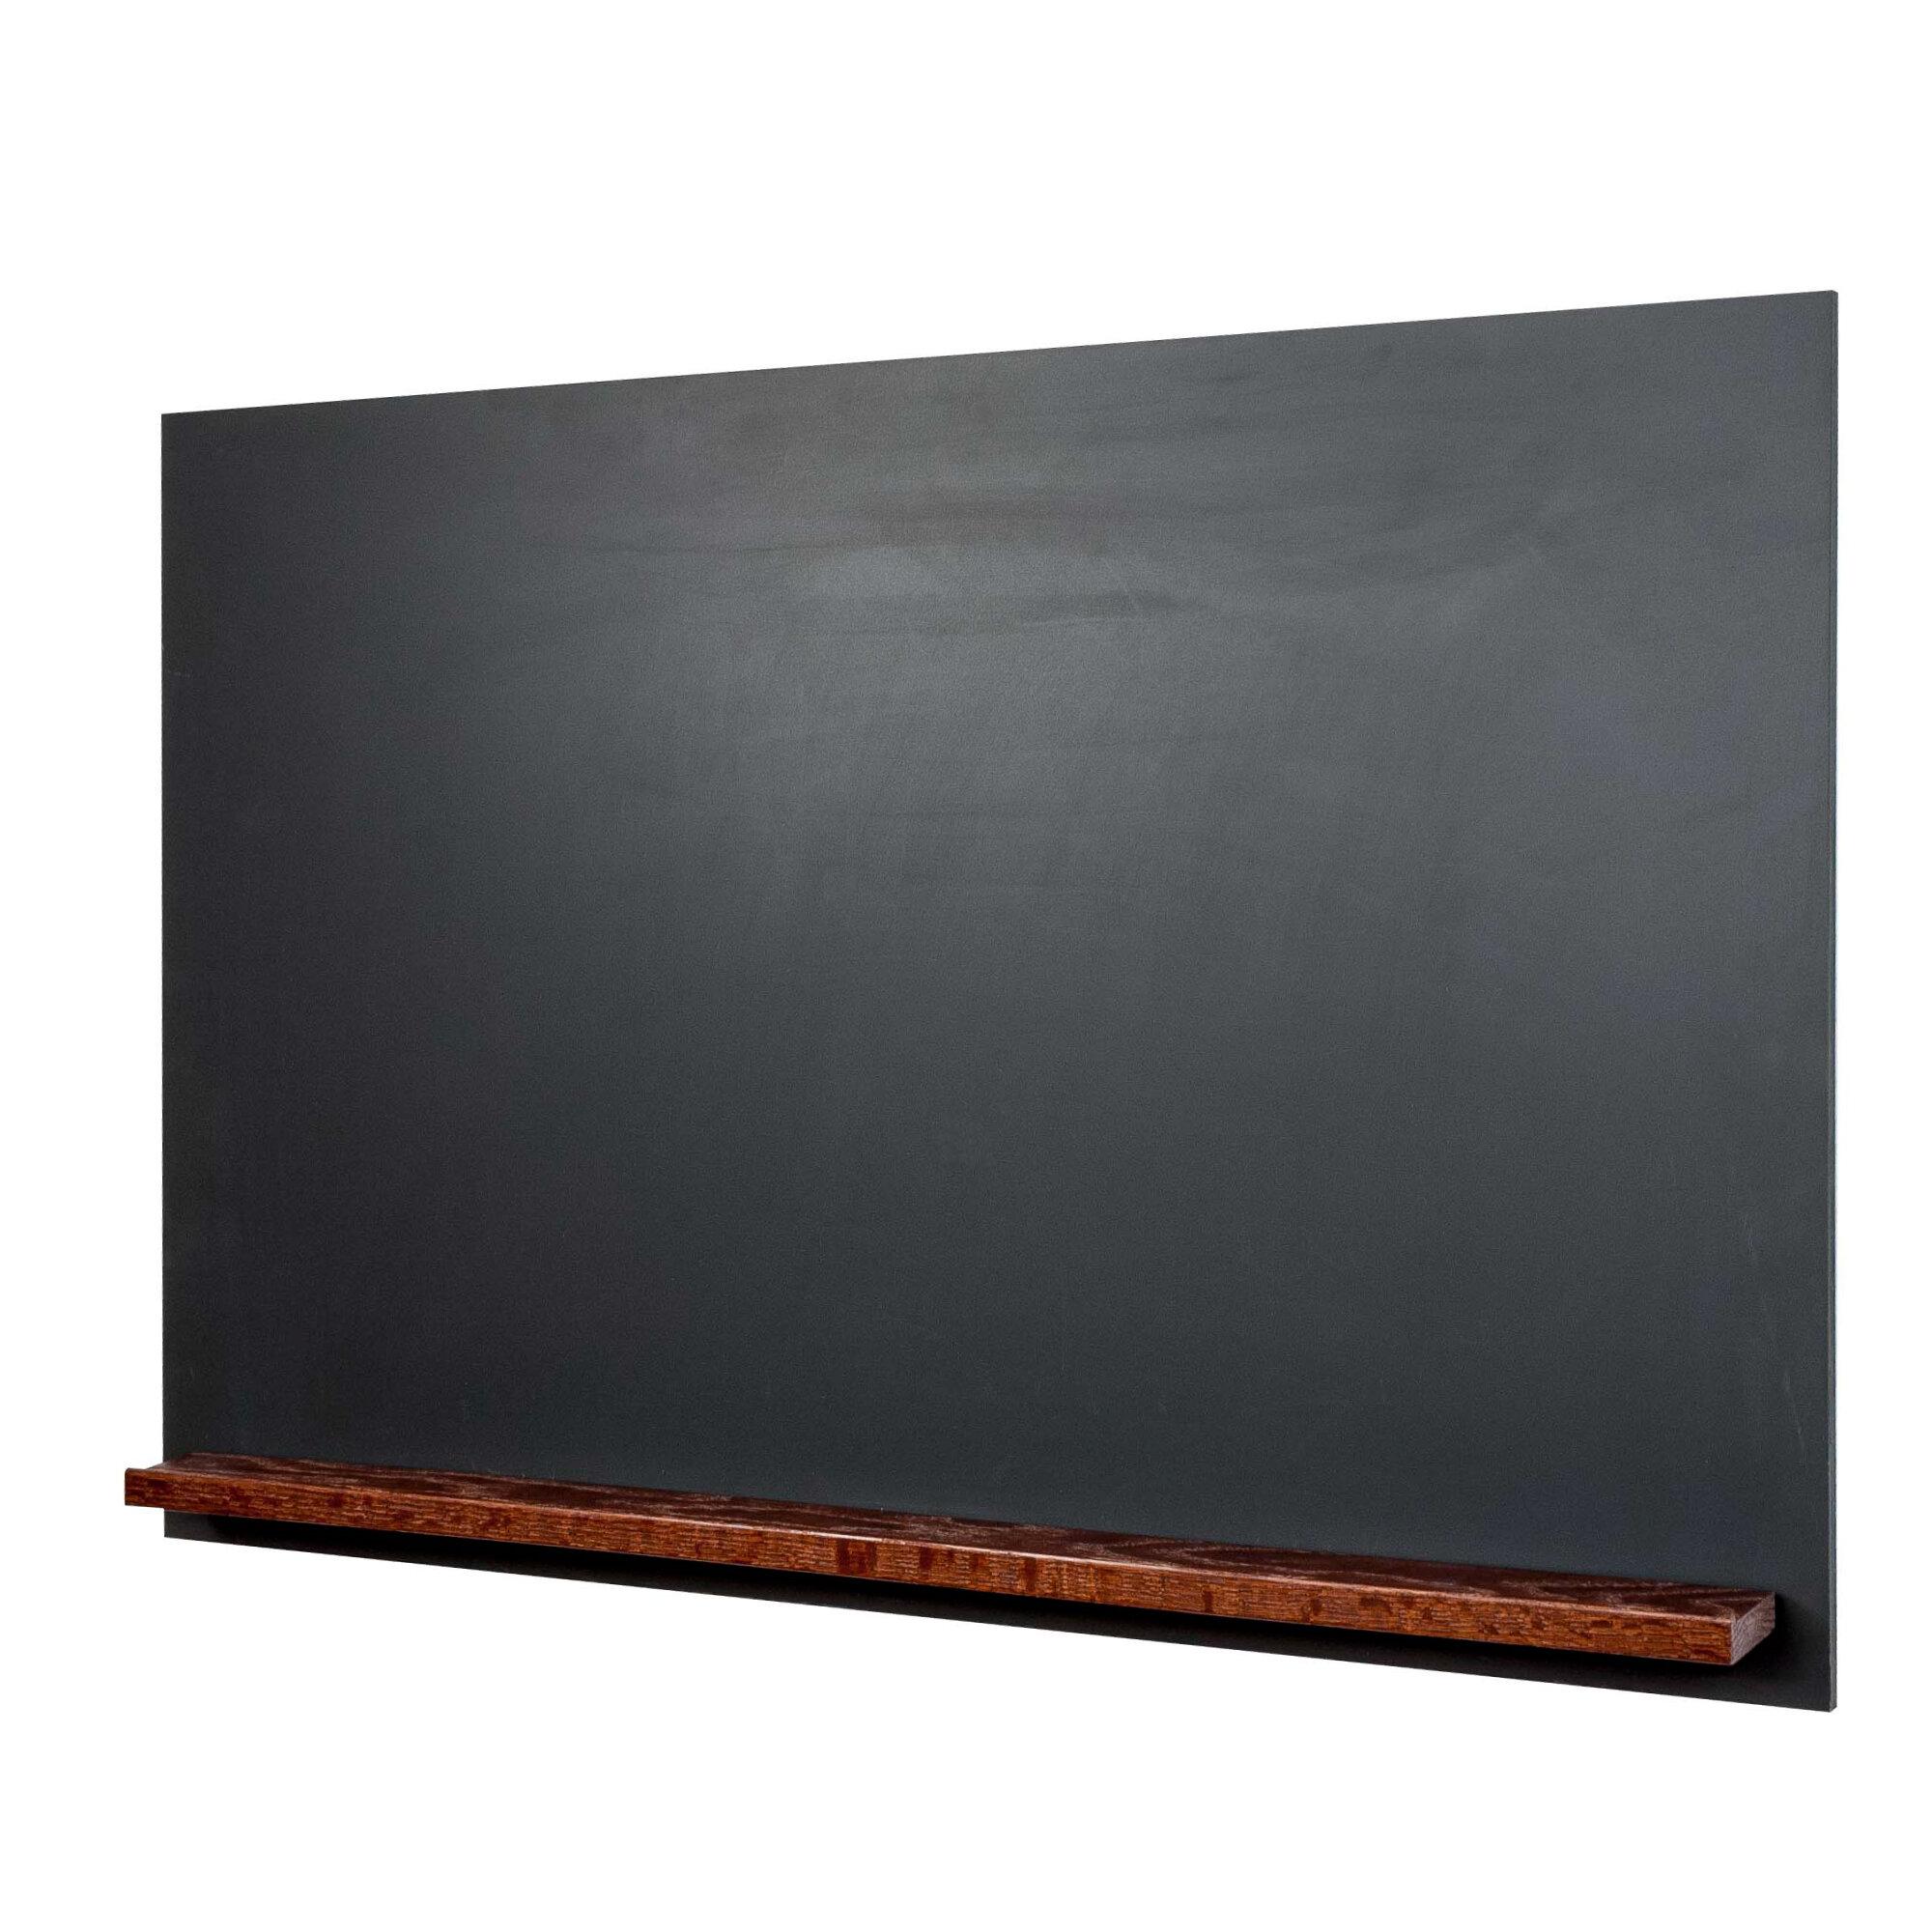 Symple Stuff Andrews Landscape Magnetic Chalkboard Reviews Wayfair